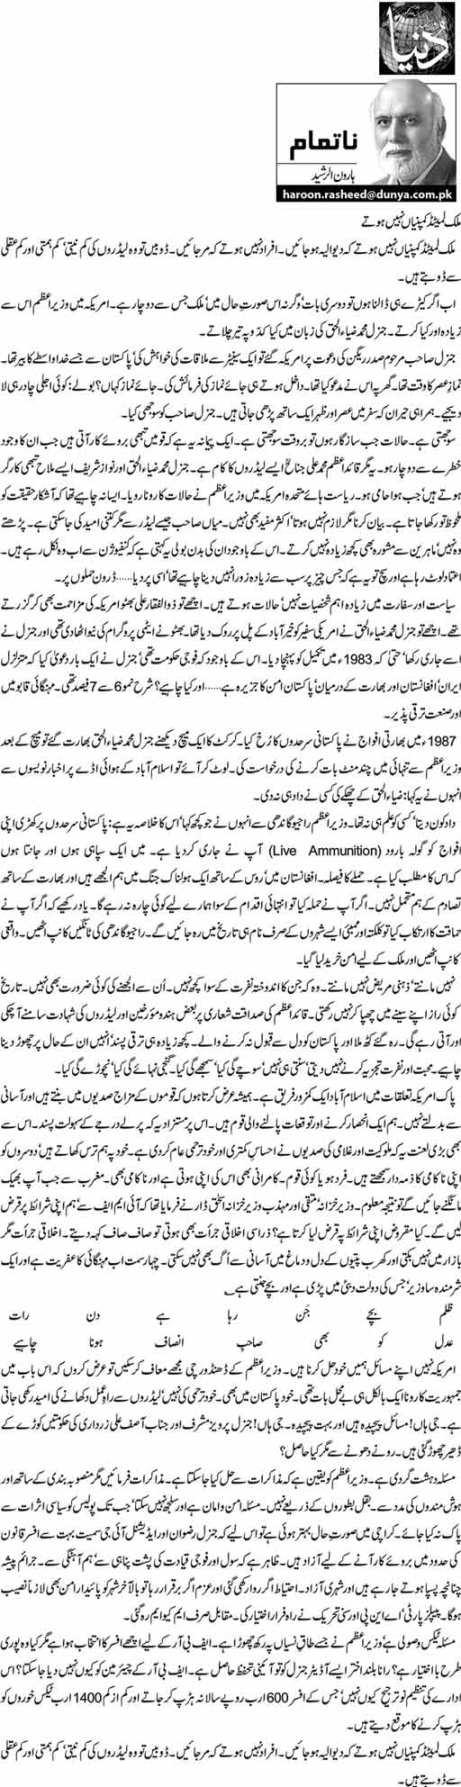 Mulk Limited Companies Nahin Hoti - Haroon ur Rasheed